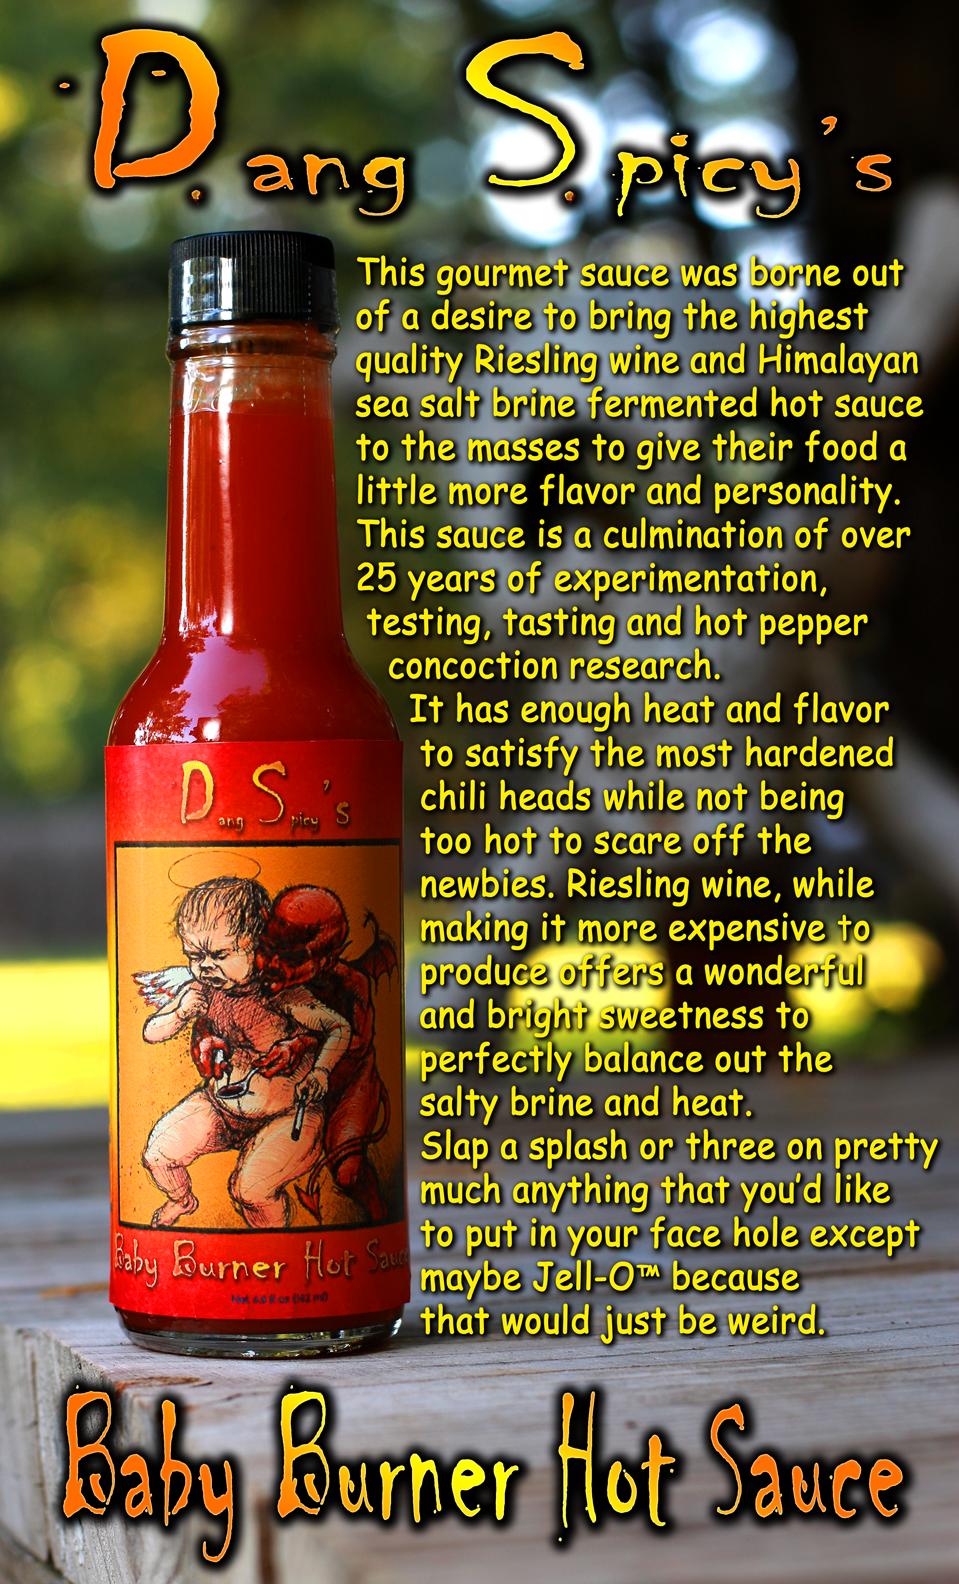 Baby_Burner_Hot_Sauce_ad